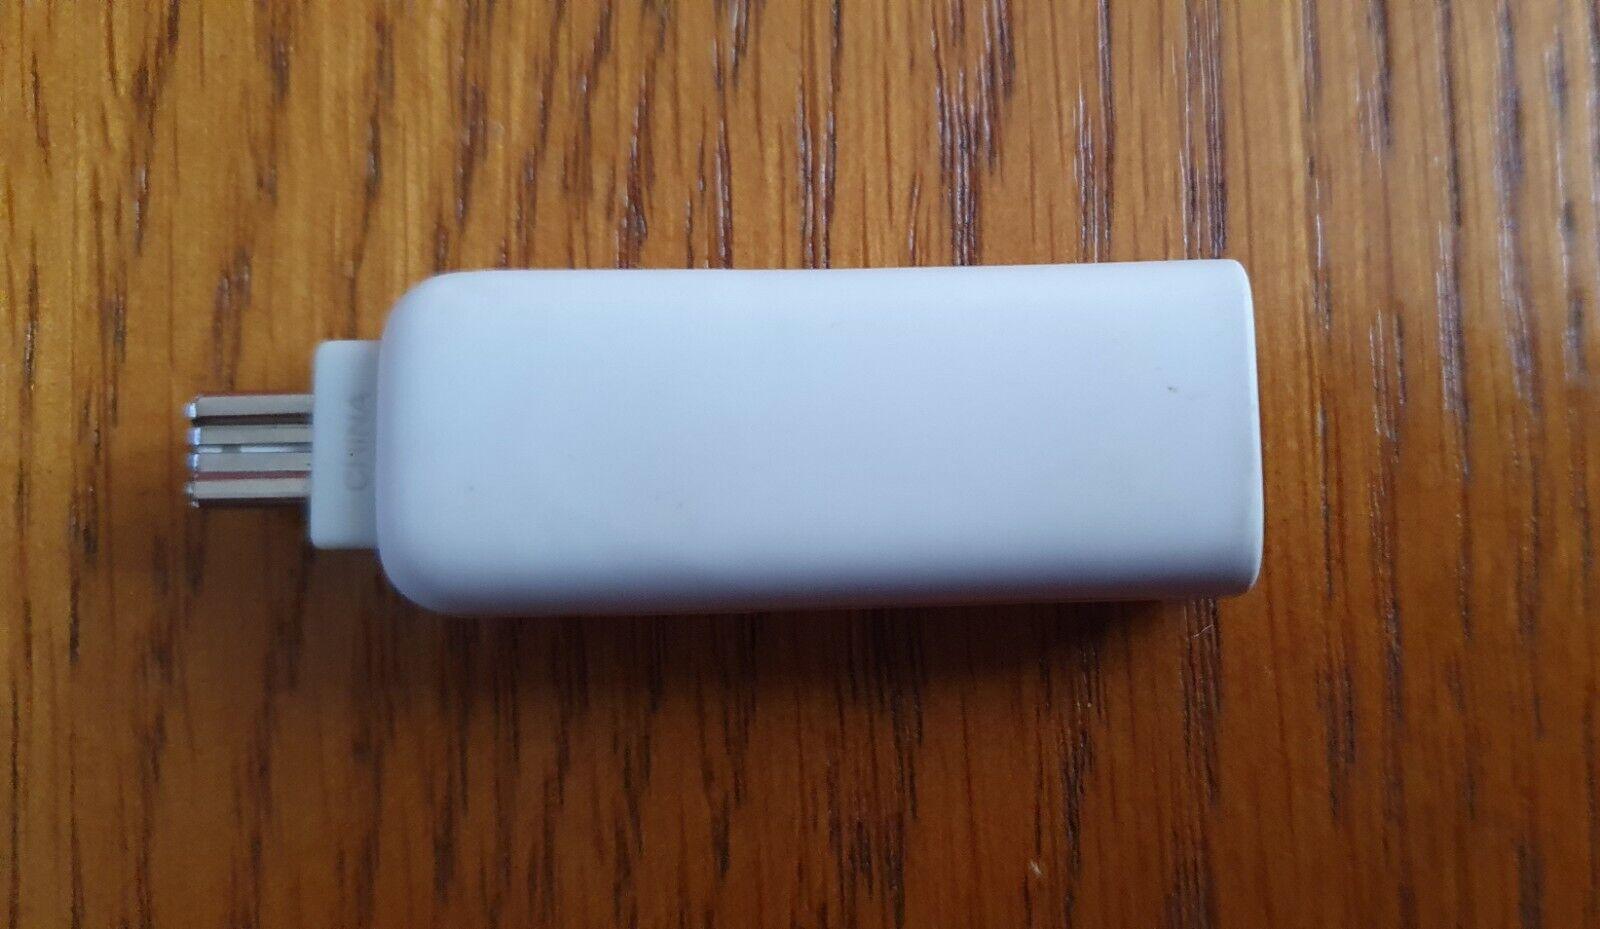 Genuine Apple Firewire Adapter